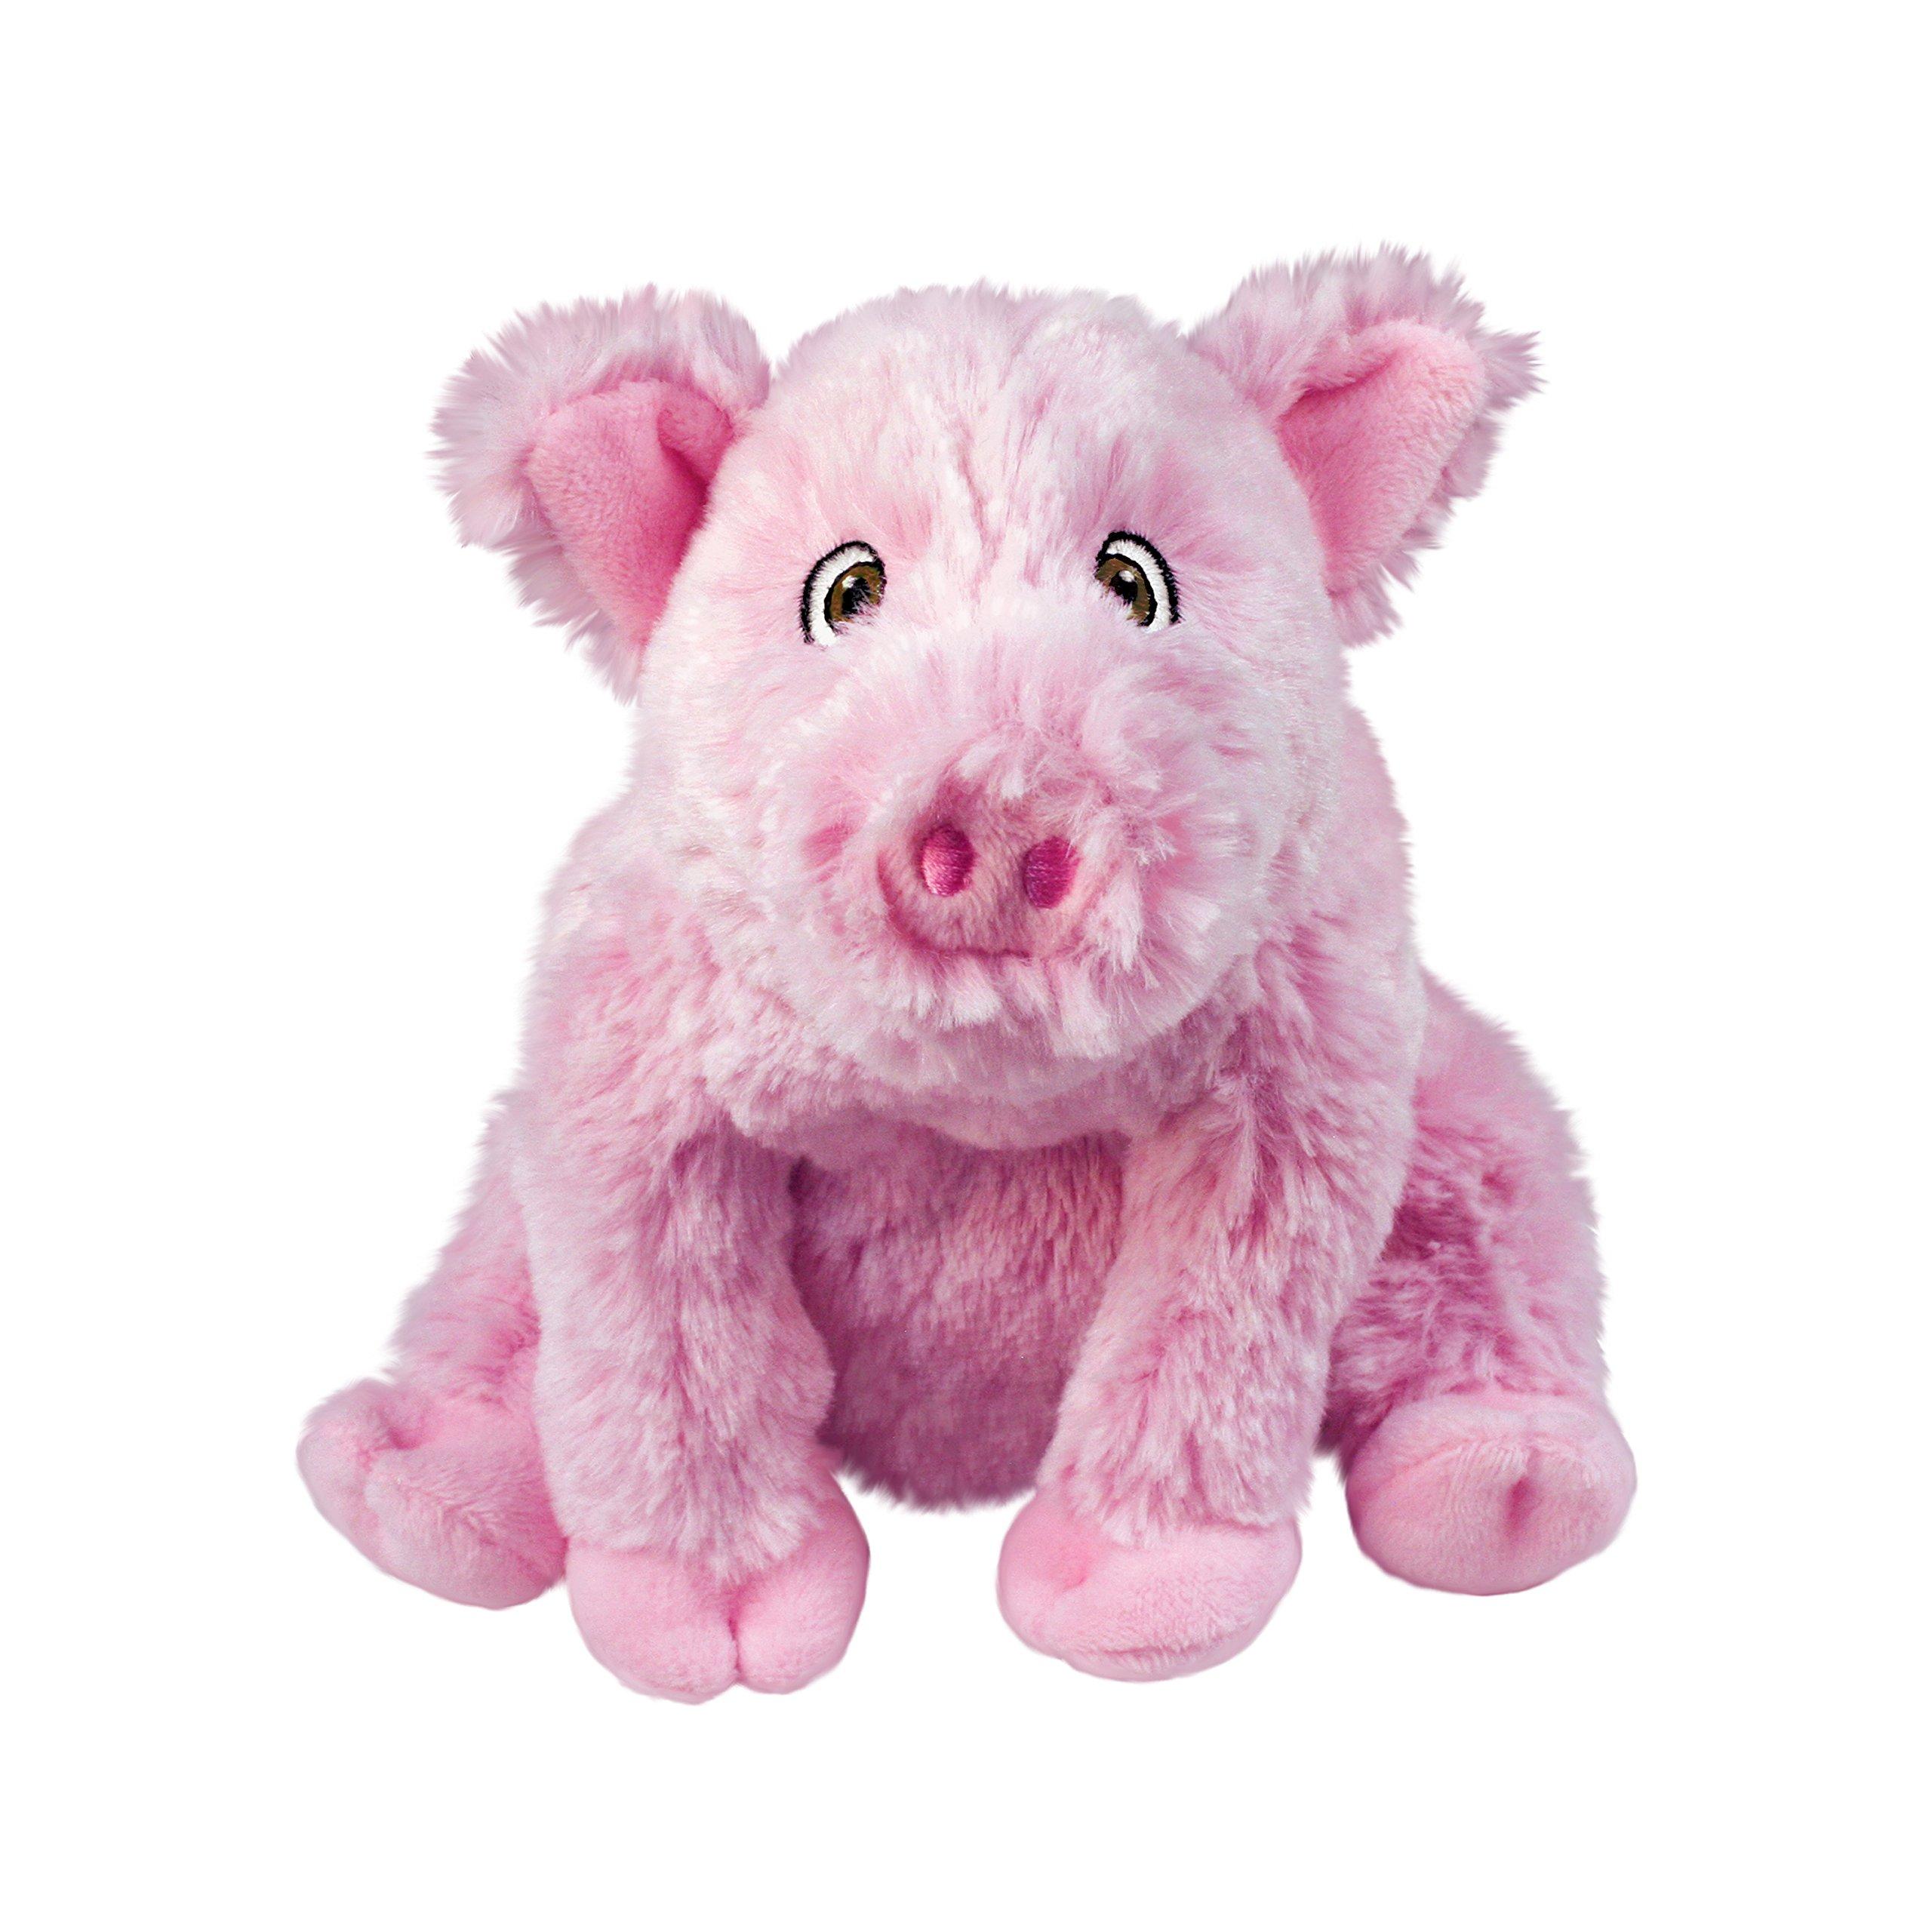 KONG Comfort Kiddos Pig Dog Toy, Large by KONG